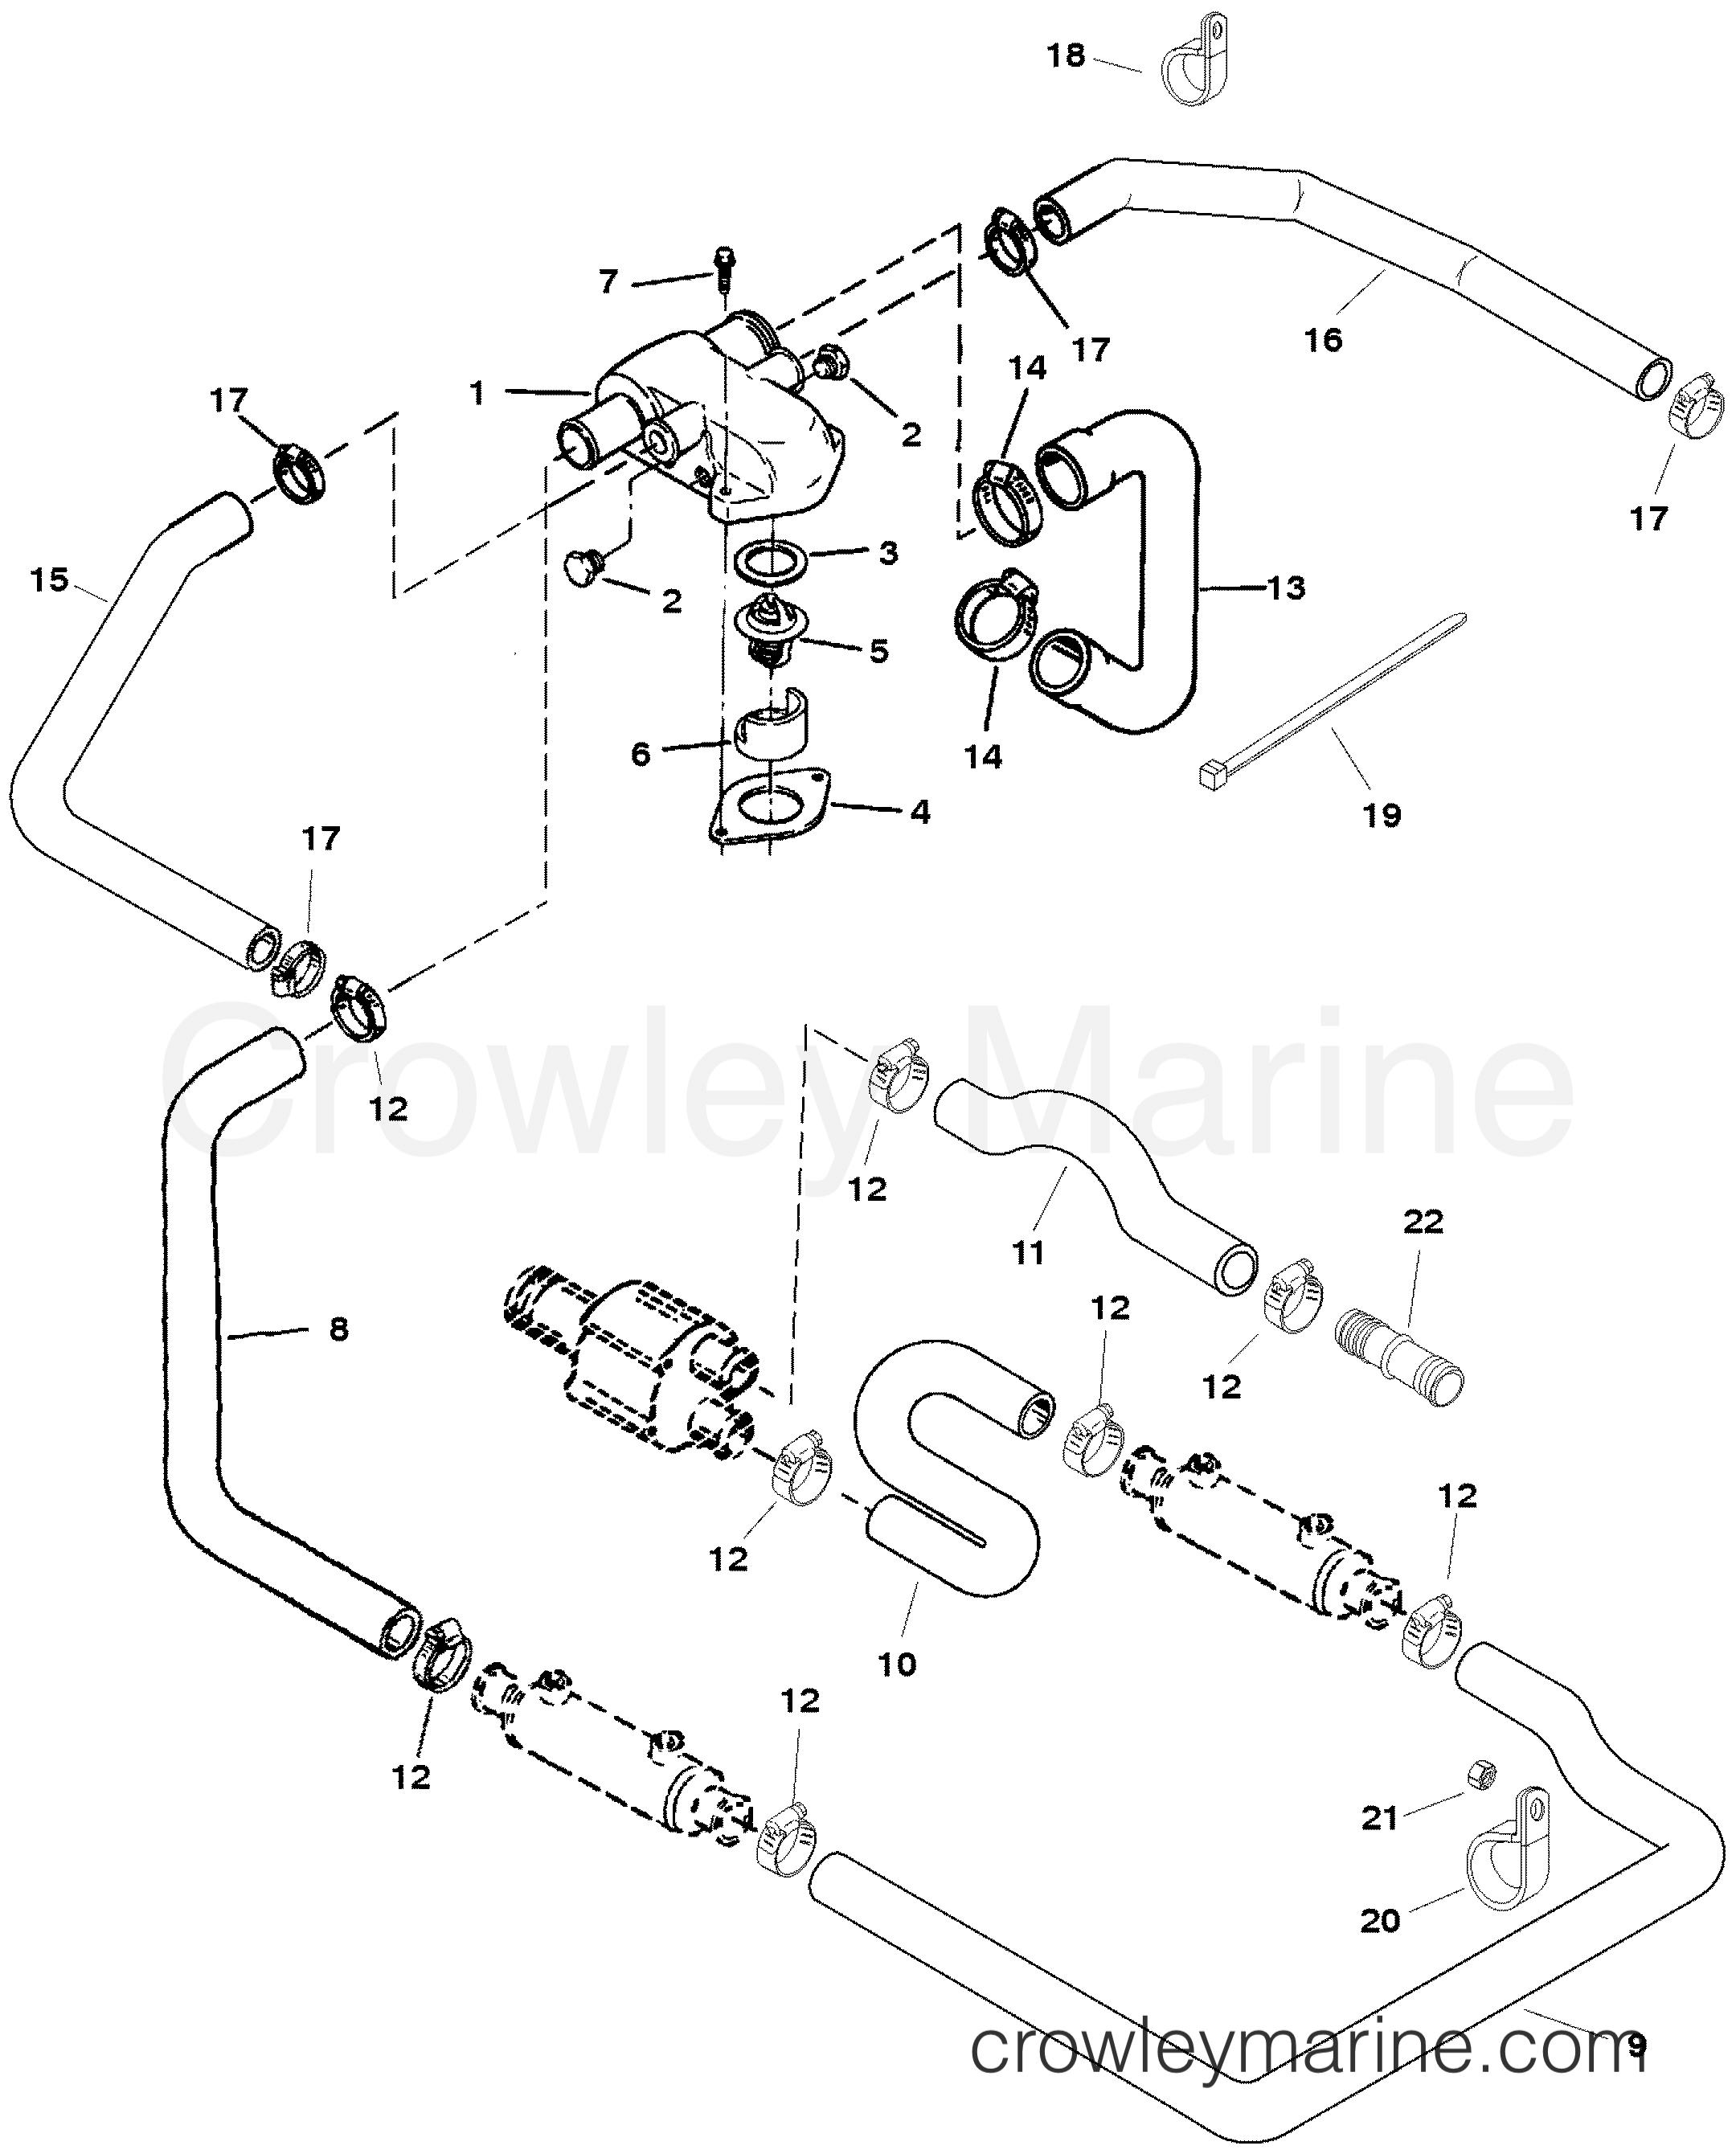 1996 Mercury Inboard Engine 7.4L [CARB] - 3741162JT - THERMOSTAT HOUSING  (STANDARD